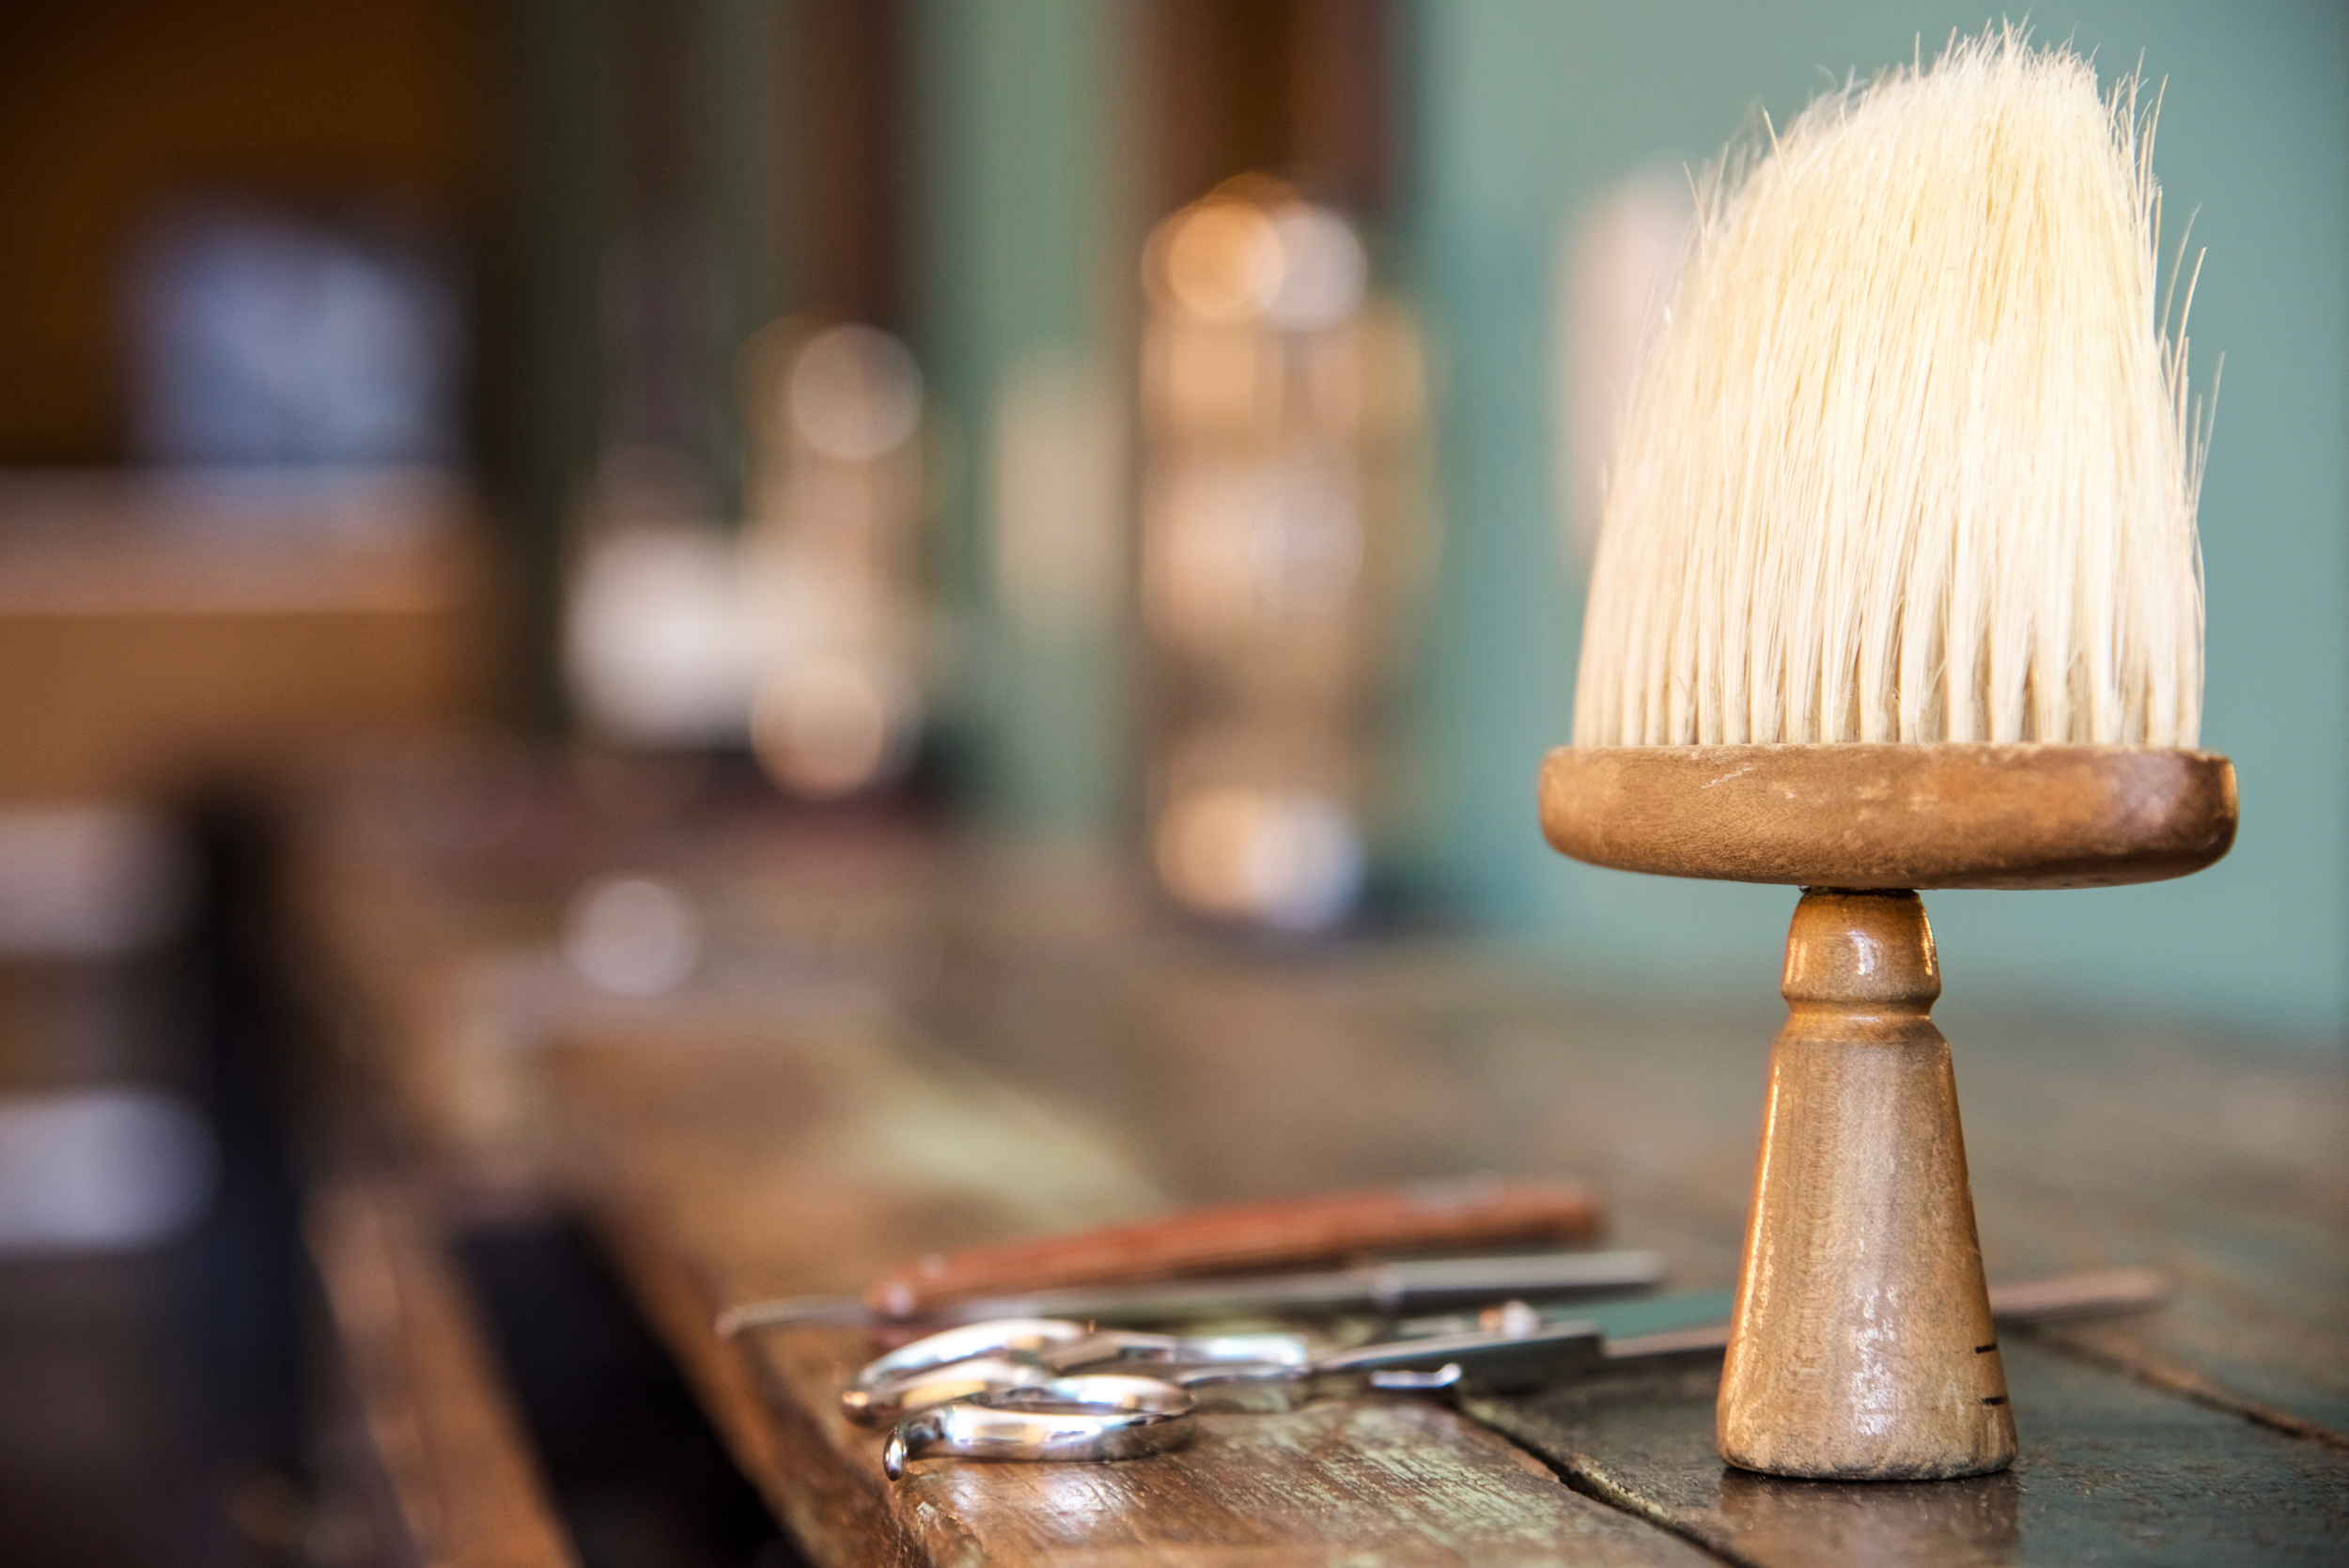 talking-heads-barber-shop-asbury-park-nj-18.jpg